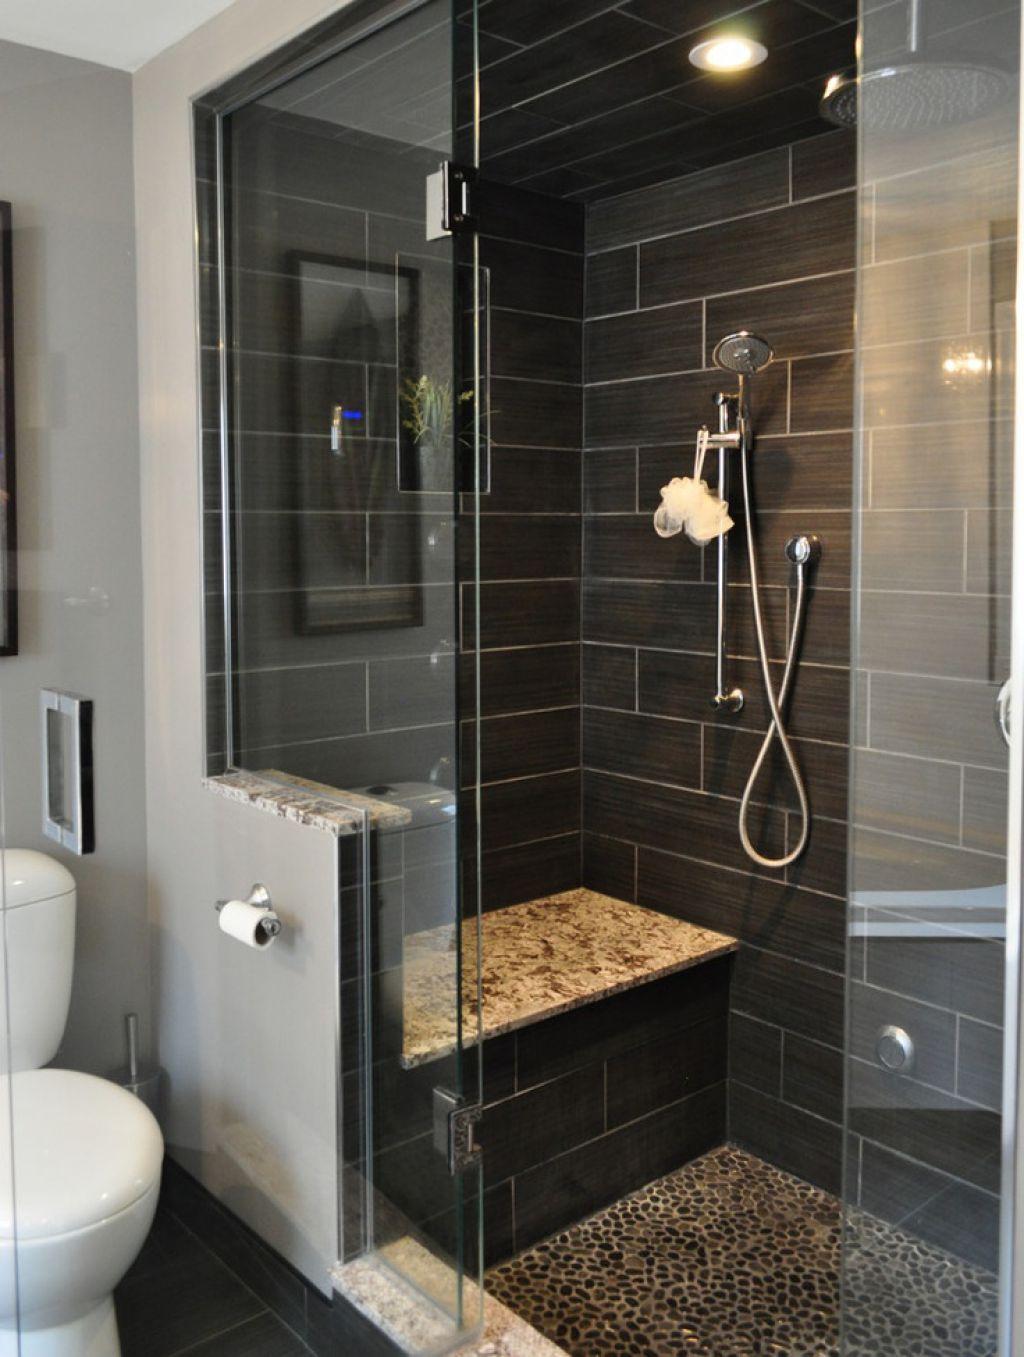 Slate tiles in bathroom - Bathroom Shower Designed With Black Slate Tiles And Built In Bench